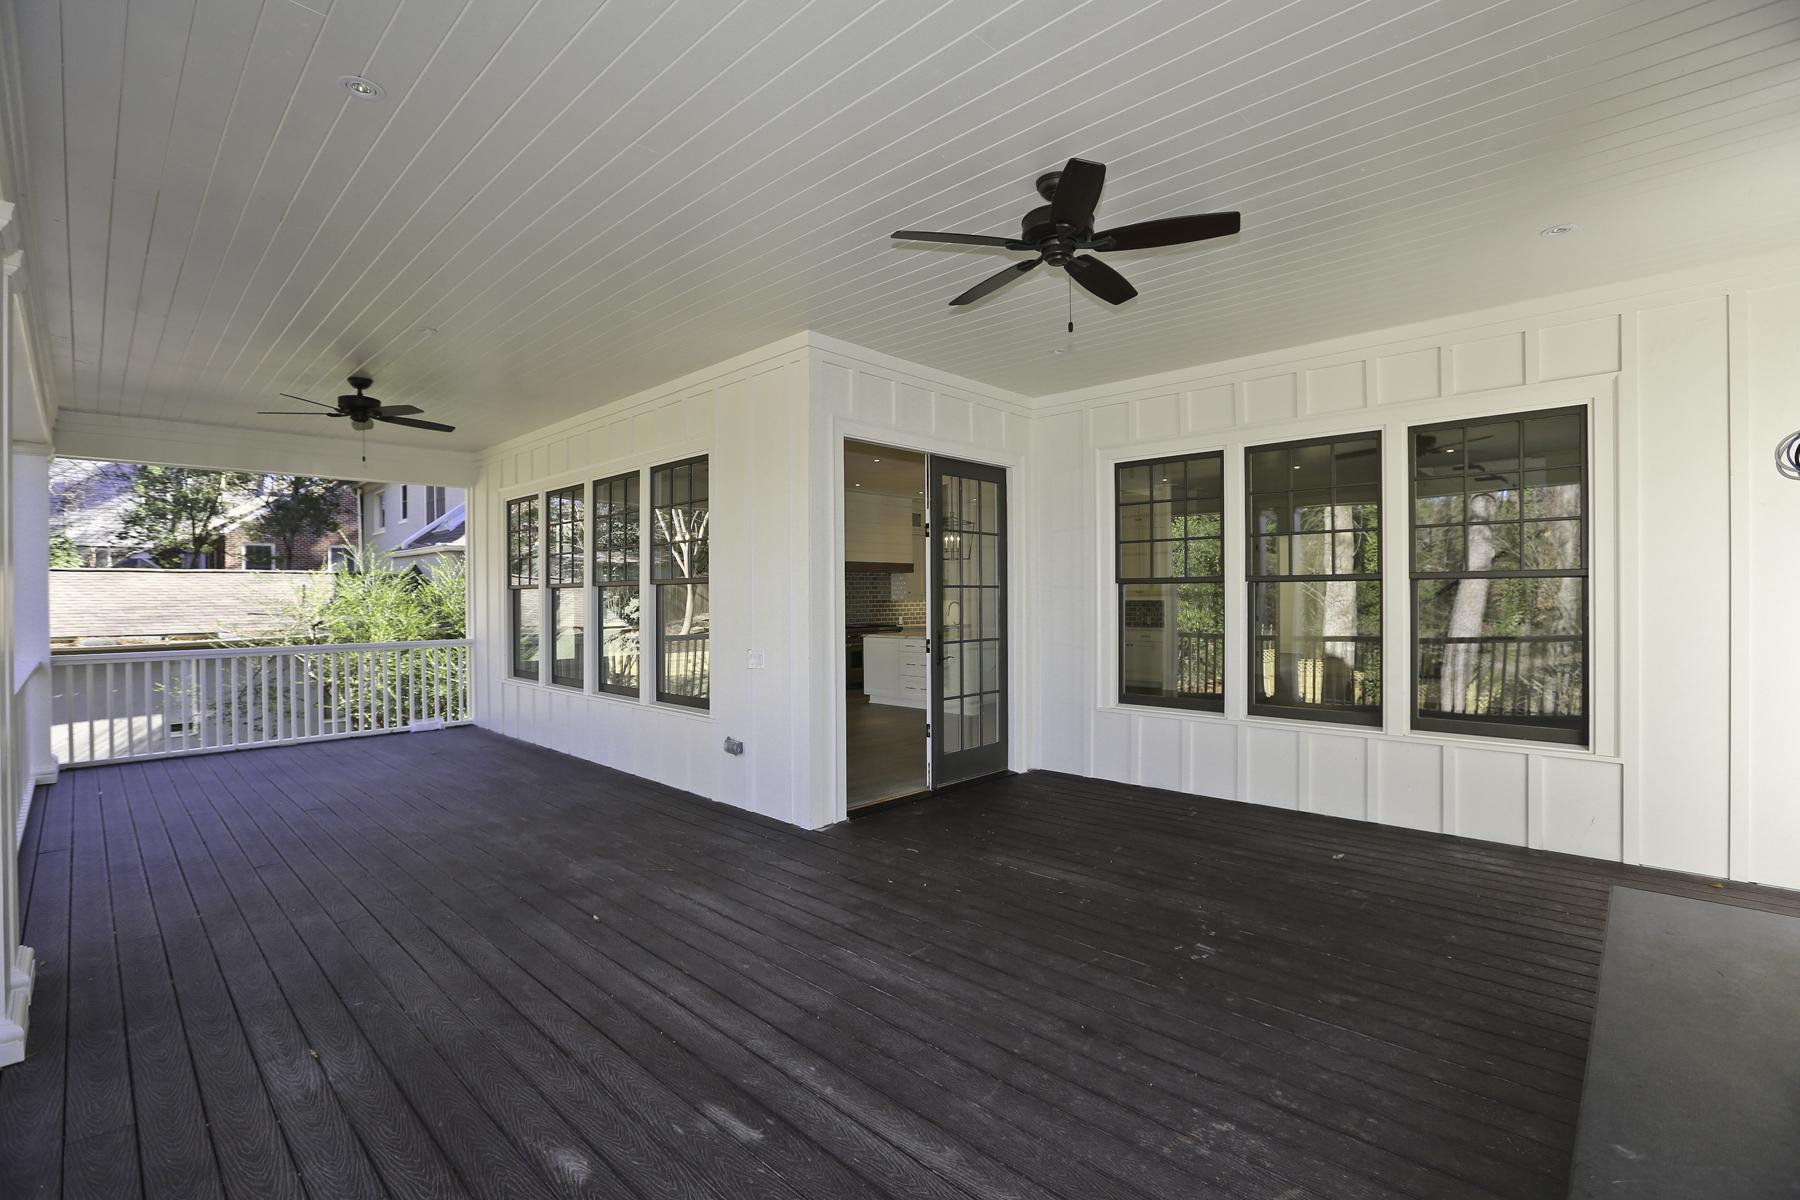 Additional photo for property listing at New Construction by JackBilt Homes. 870 Wildwood Road NE Atlanta, Georgia 30324 Hoa Kỳ